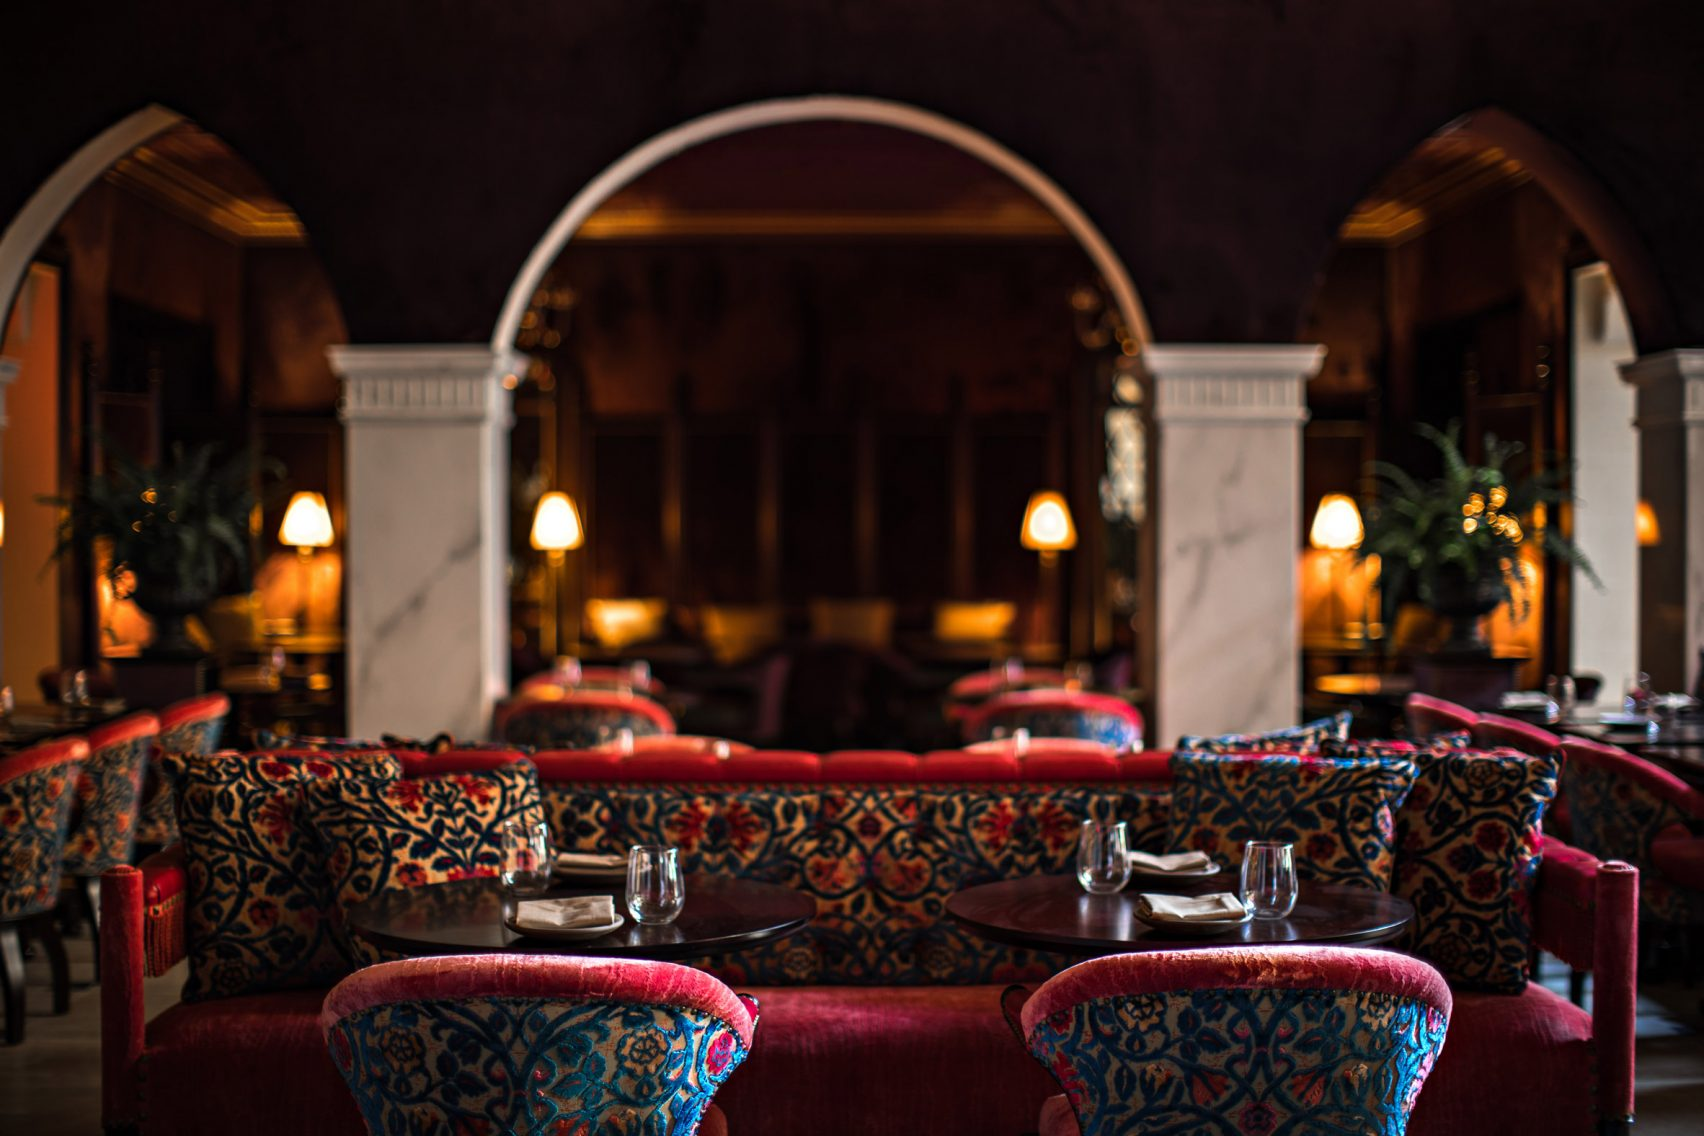 nomad-hotel-los-angeles-jacques-garcia-usa-interiors_dezeen_2364_col_11-1704x1136